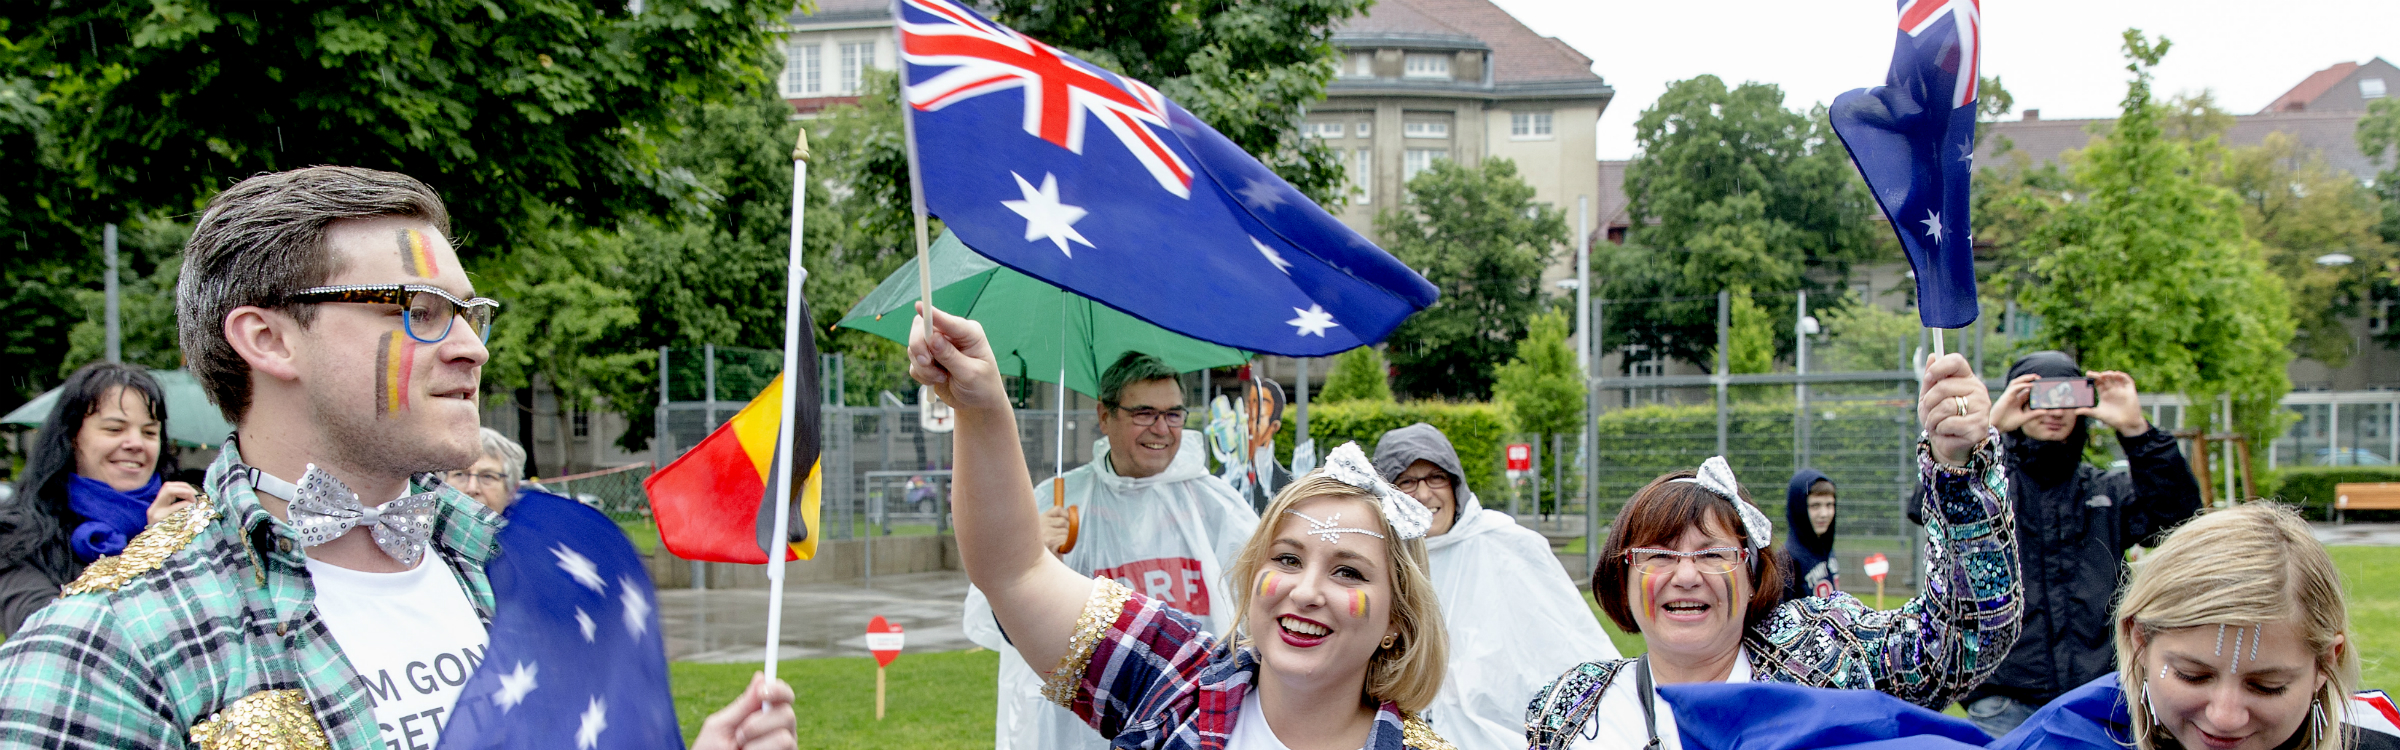 Songfestival australie